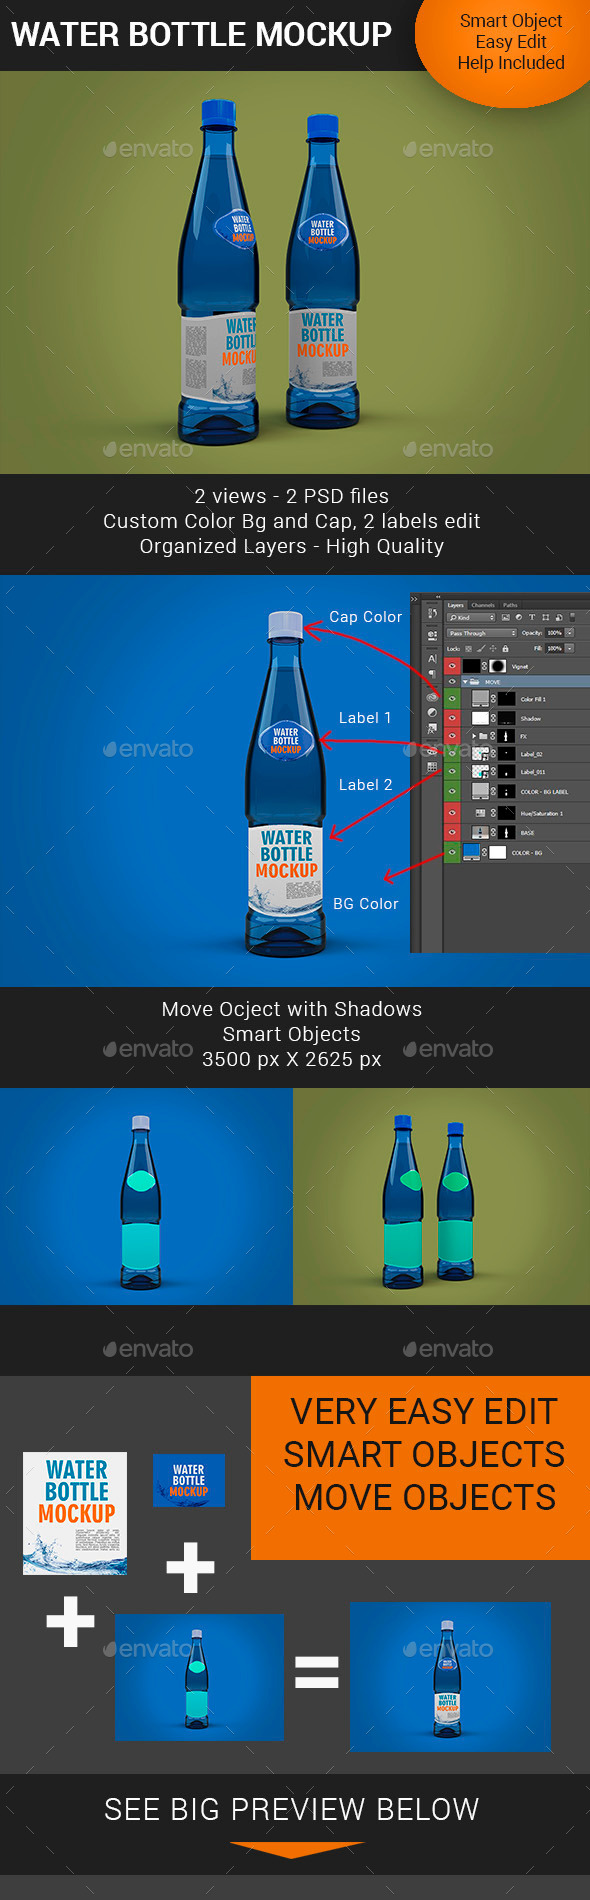 Water Bottle Mockup Premium - Food and Drink Packaging